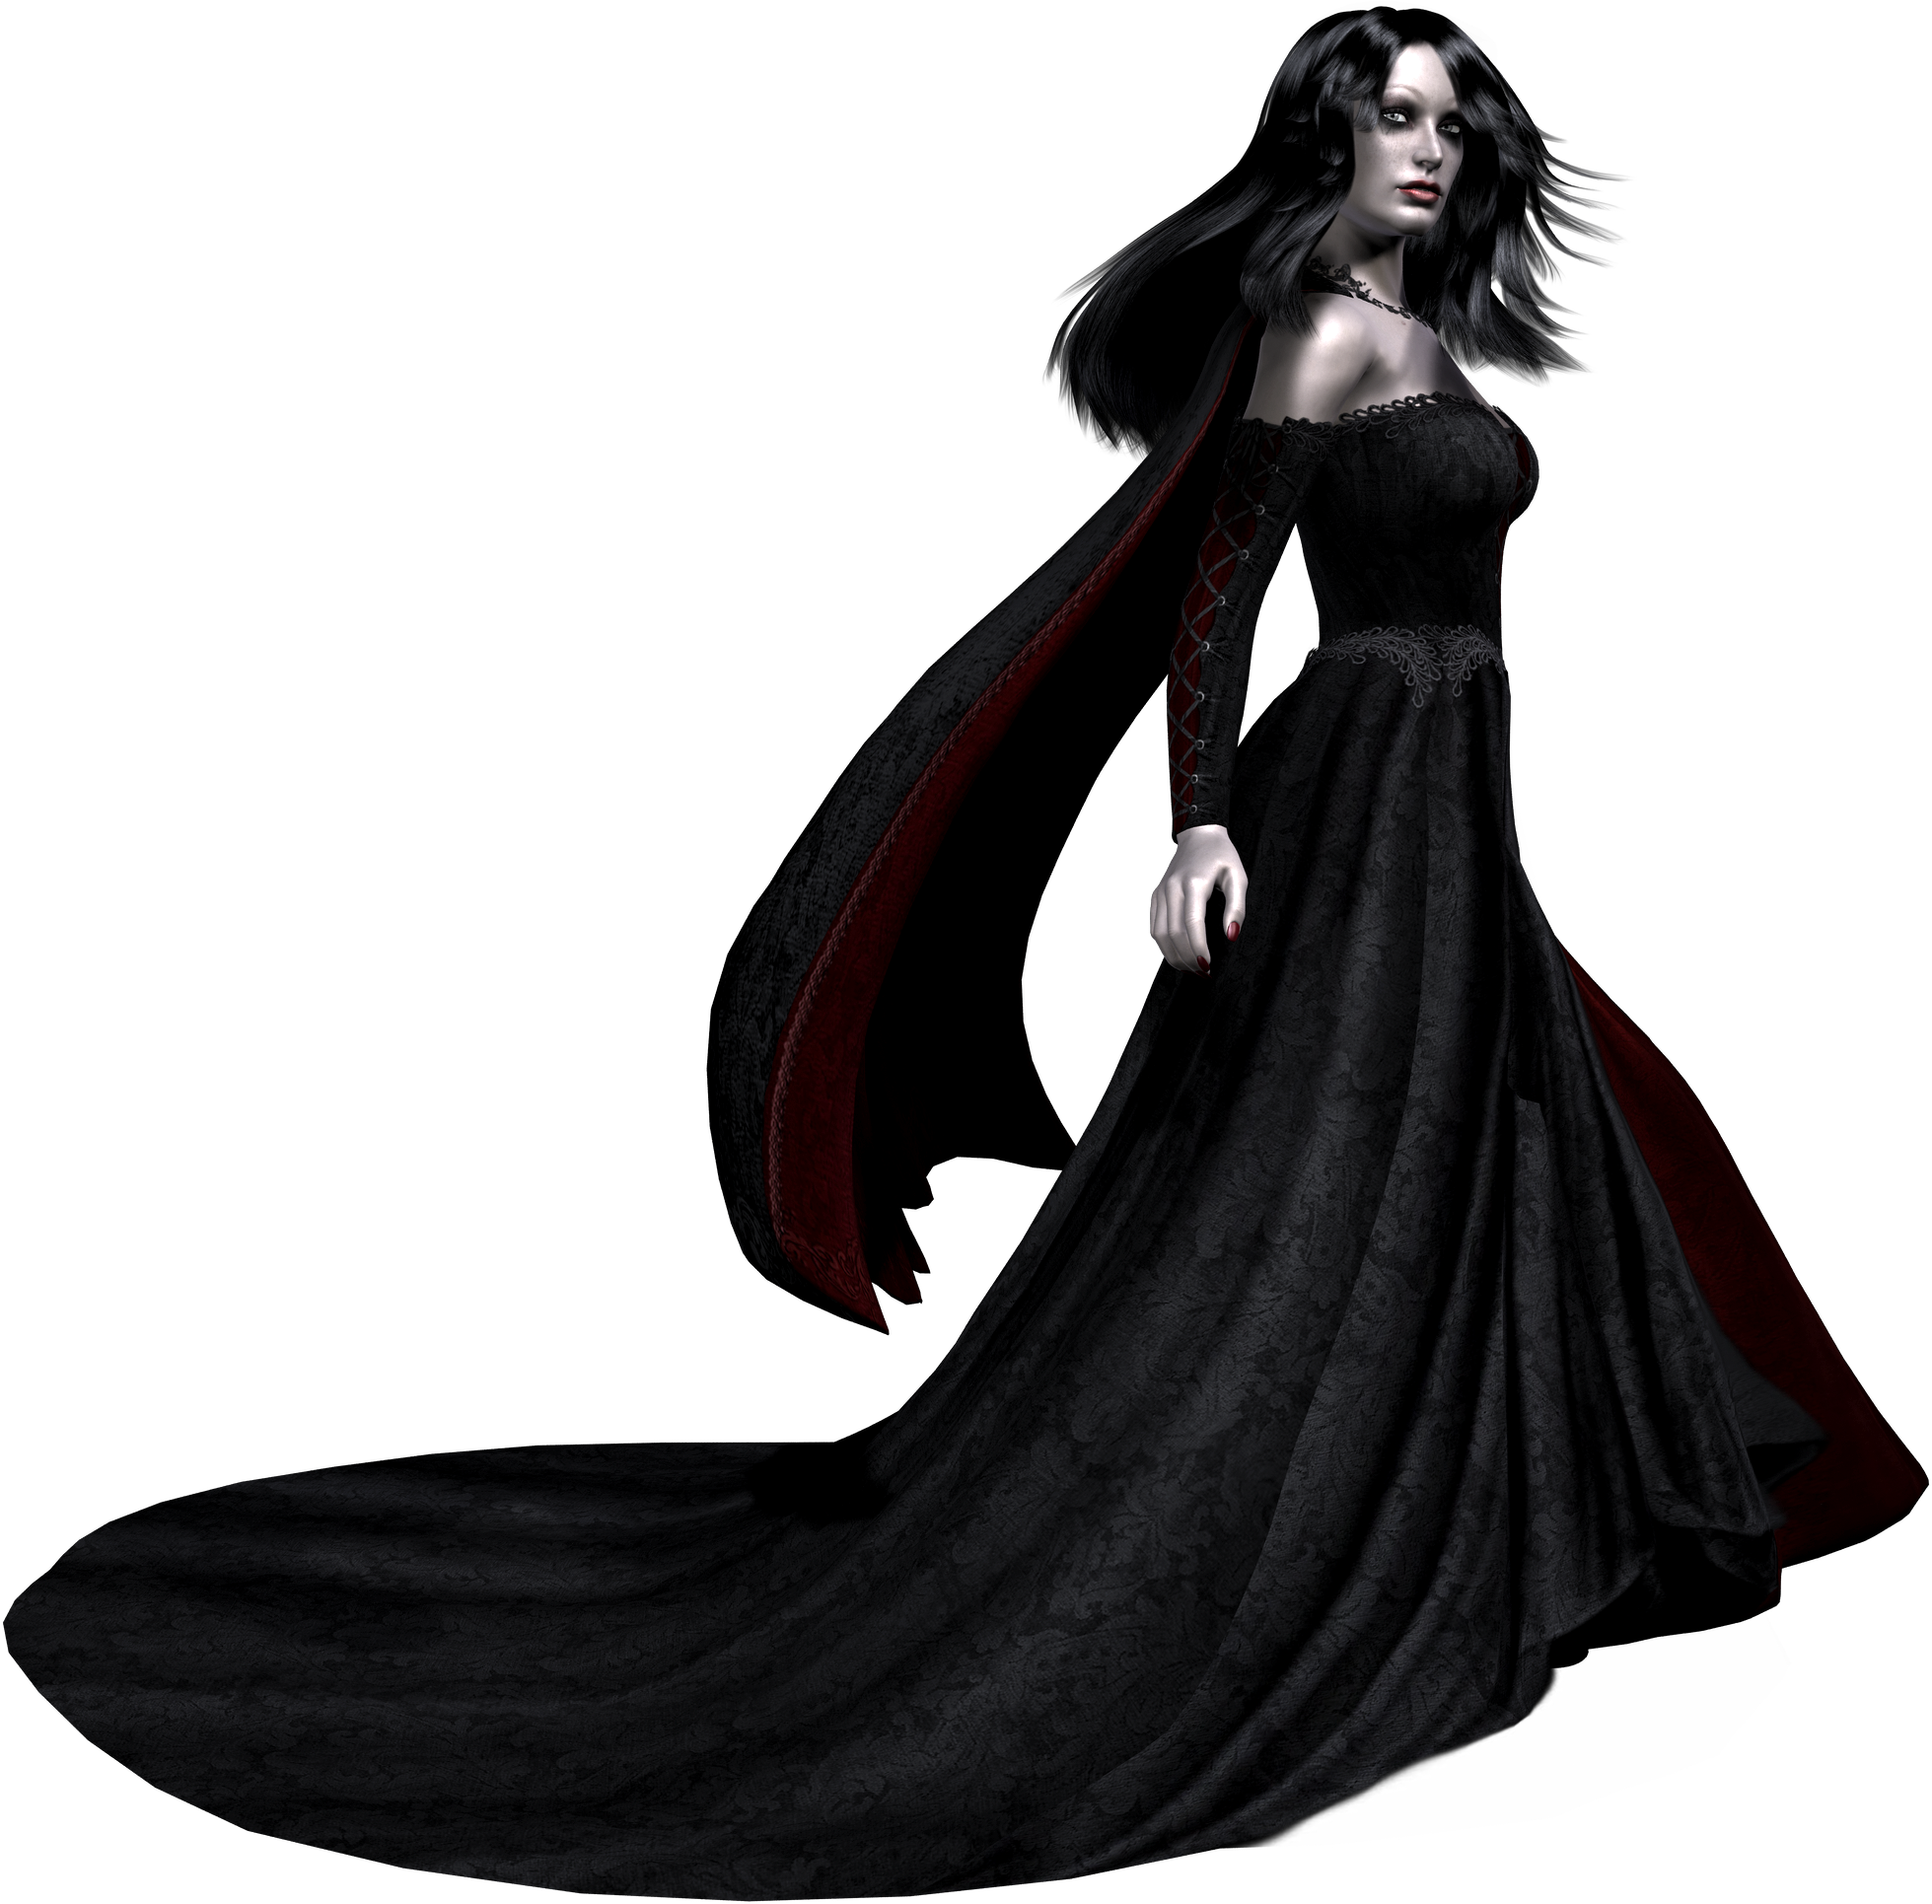 X-the-rock-girl-x :: OhMyDollz : Le jeu des dolls (doll, dollz) virtuelles  - jeu de mode - habillage, jeu de stylisme ! - Girl Vampire PNG